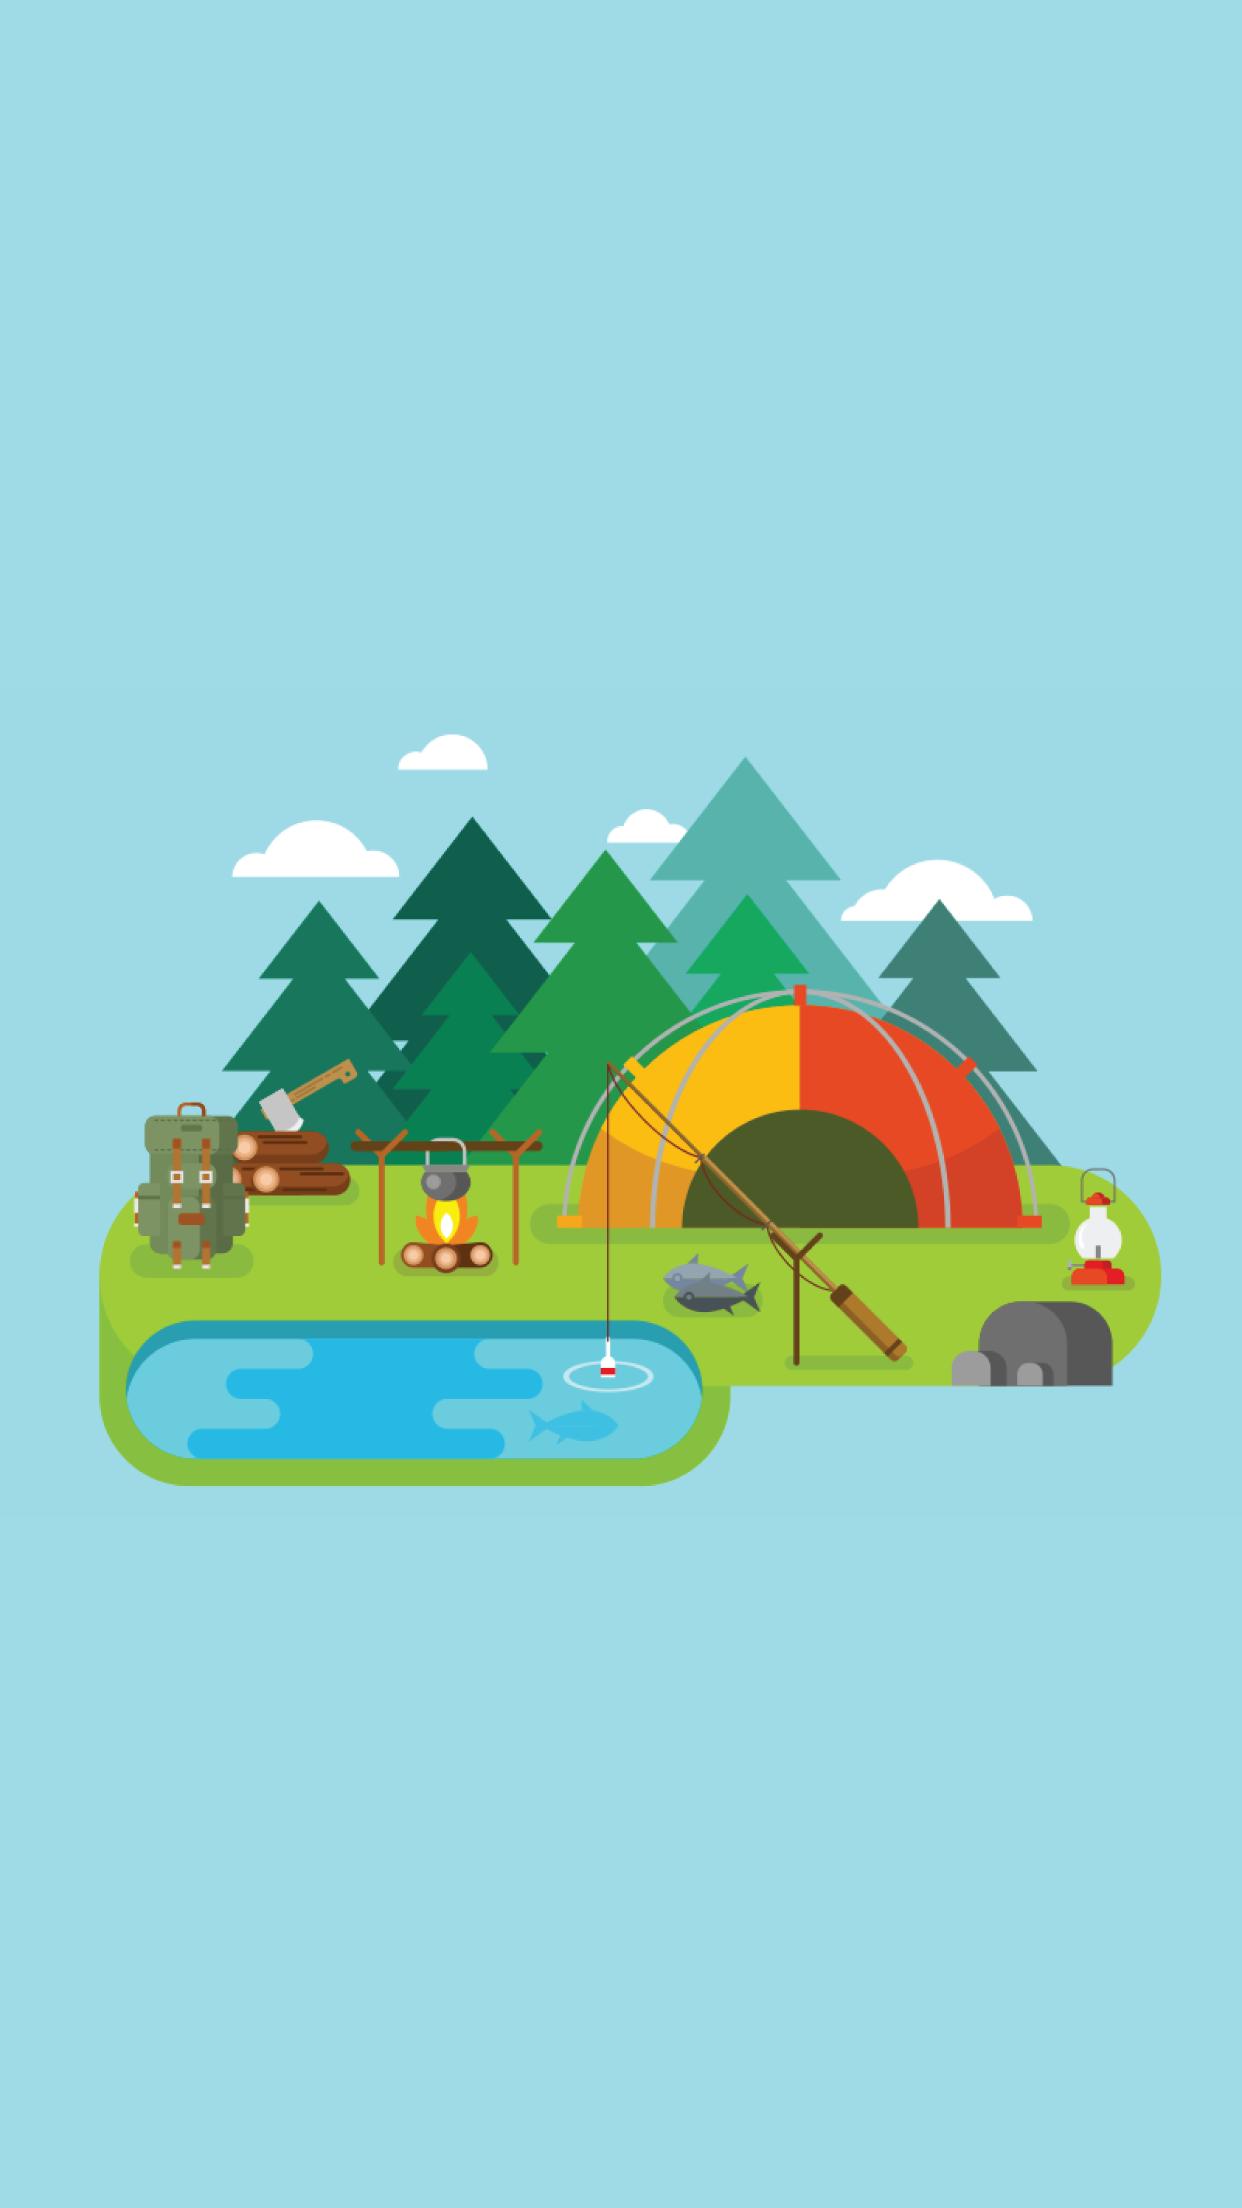 camping_minimalism-56677 Hd Diagram on phone diagram, ad diagram, cpu diagram, vhs diagram, usb diagram, beach diagram, funny diagram, ram diagram, dvr diagram,